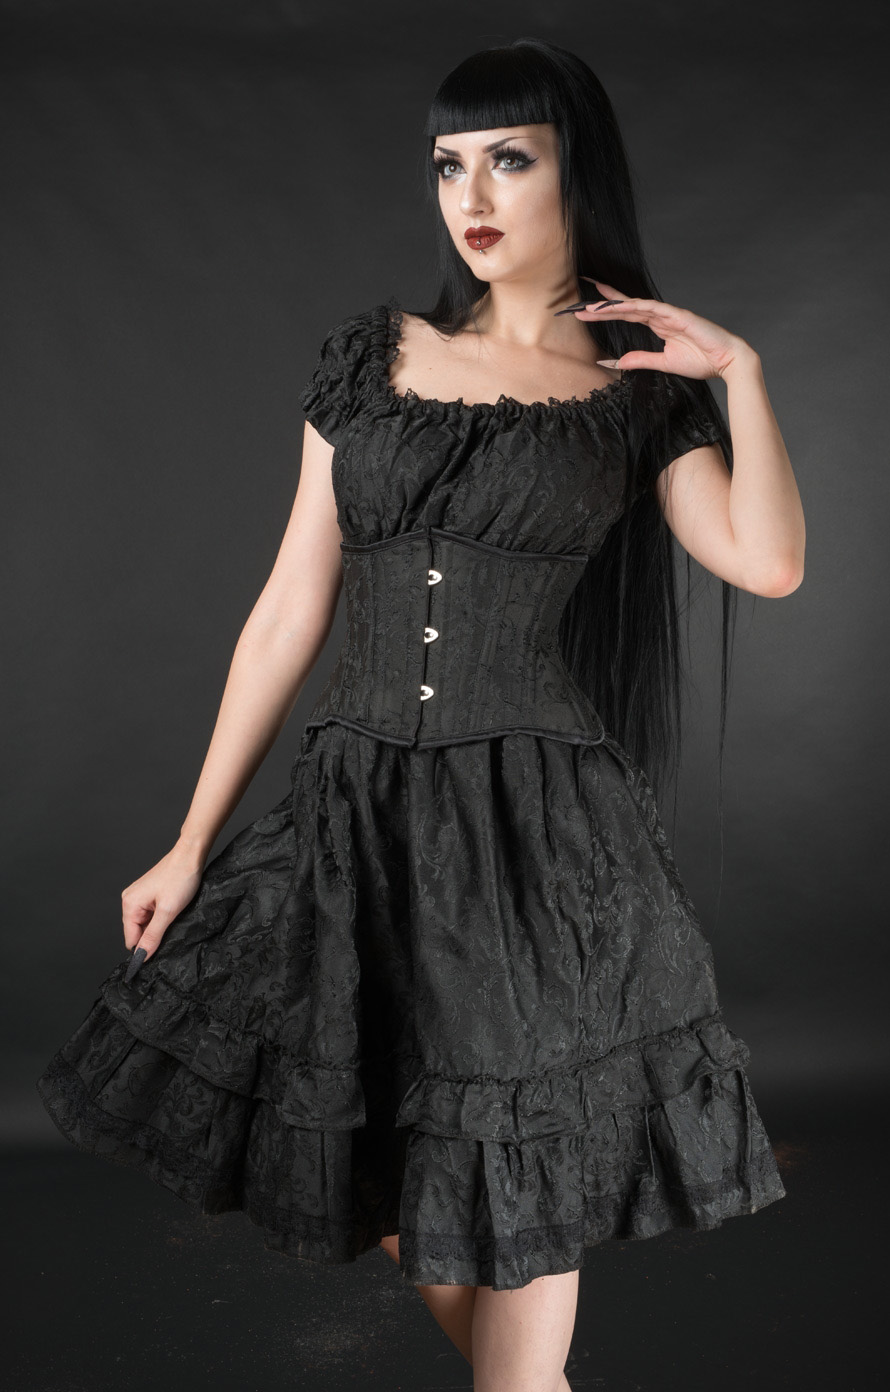 rebelsmarket_black_brocade_gothic_rockabilly_ruffle_corset_dress_6_to_ship_worldwide_dresses_3.jpg